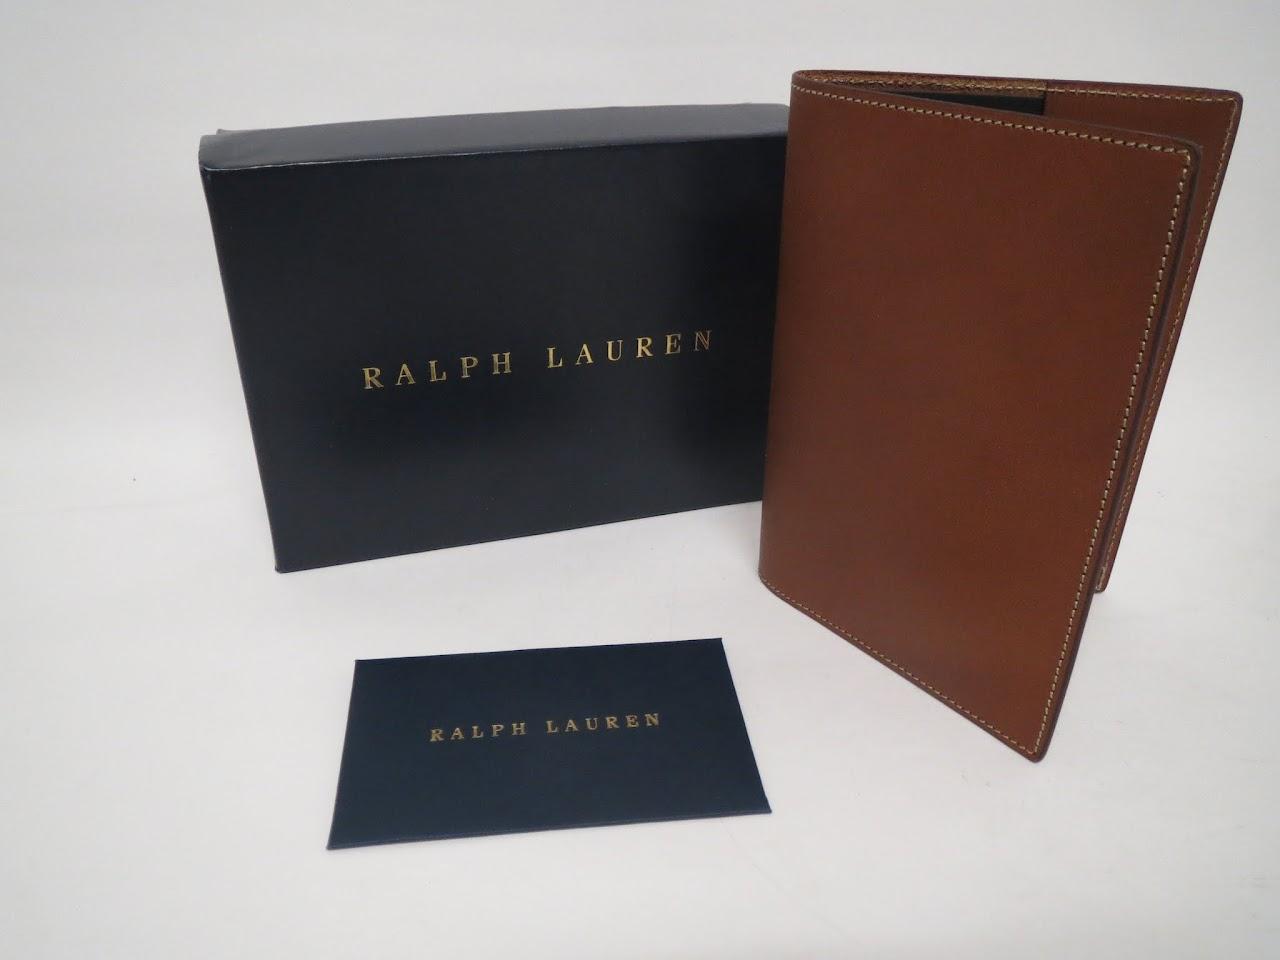 Ralph Lauren Passport Holder